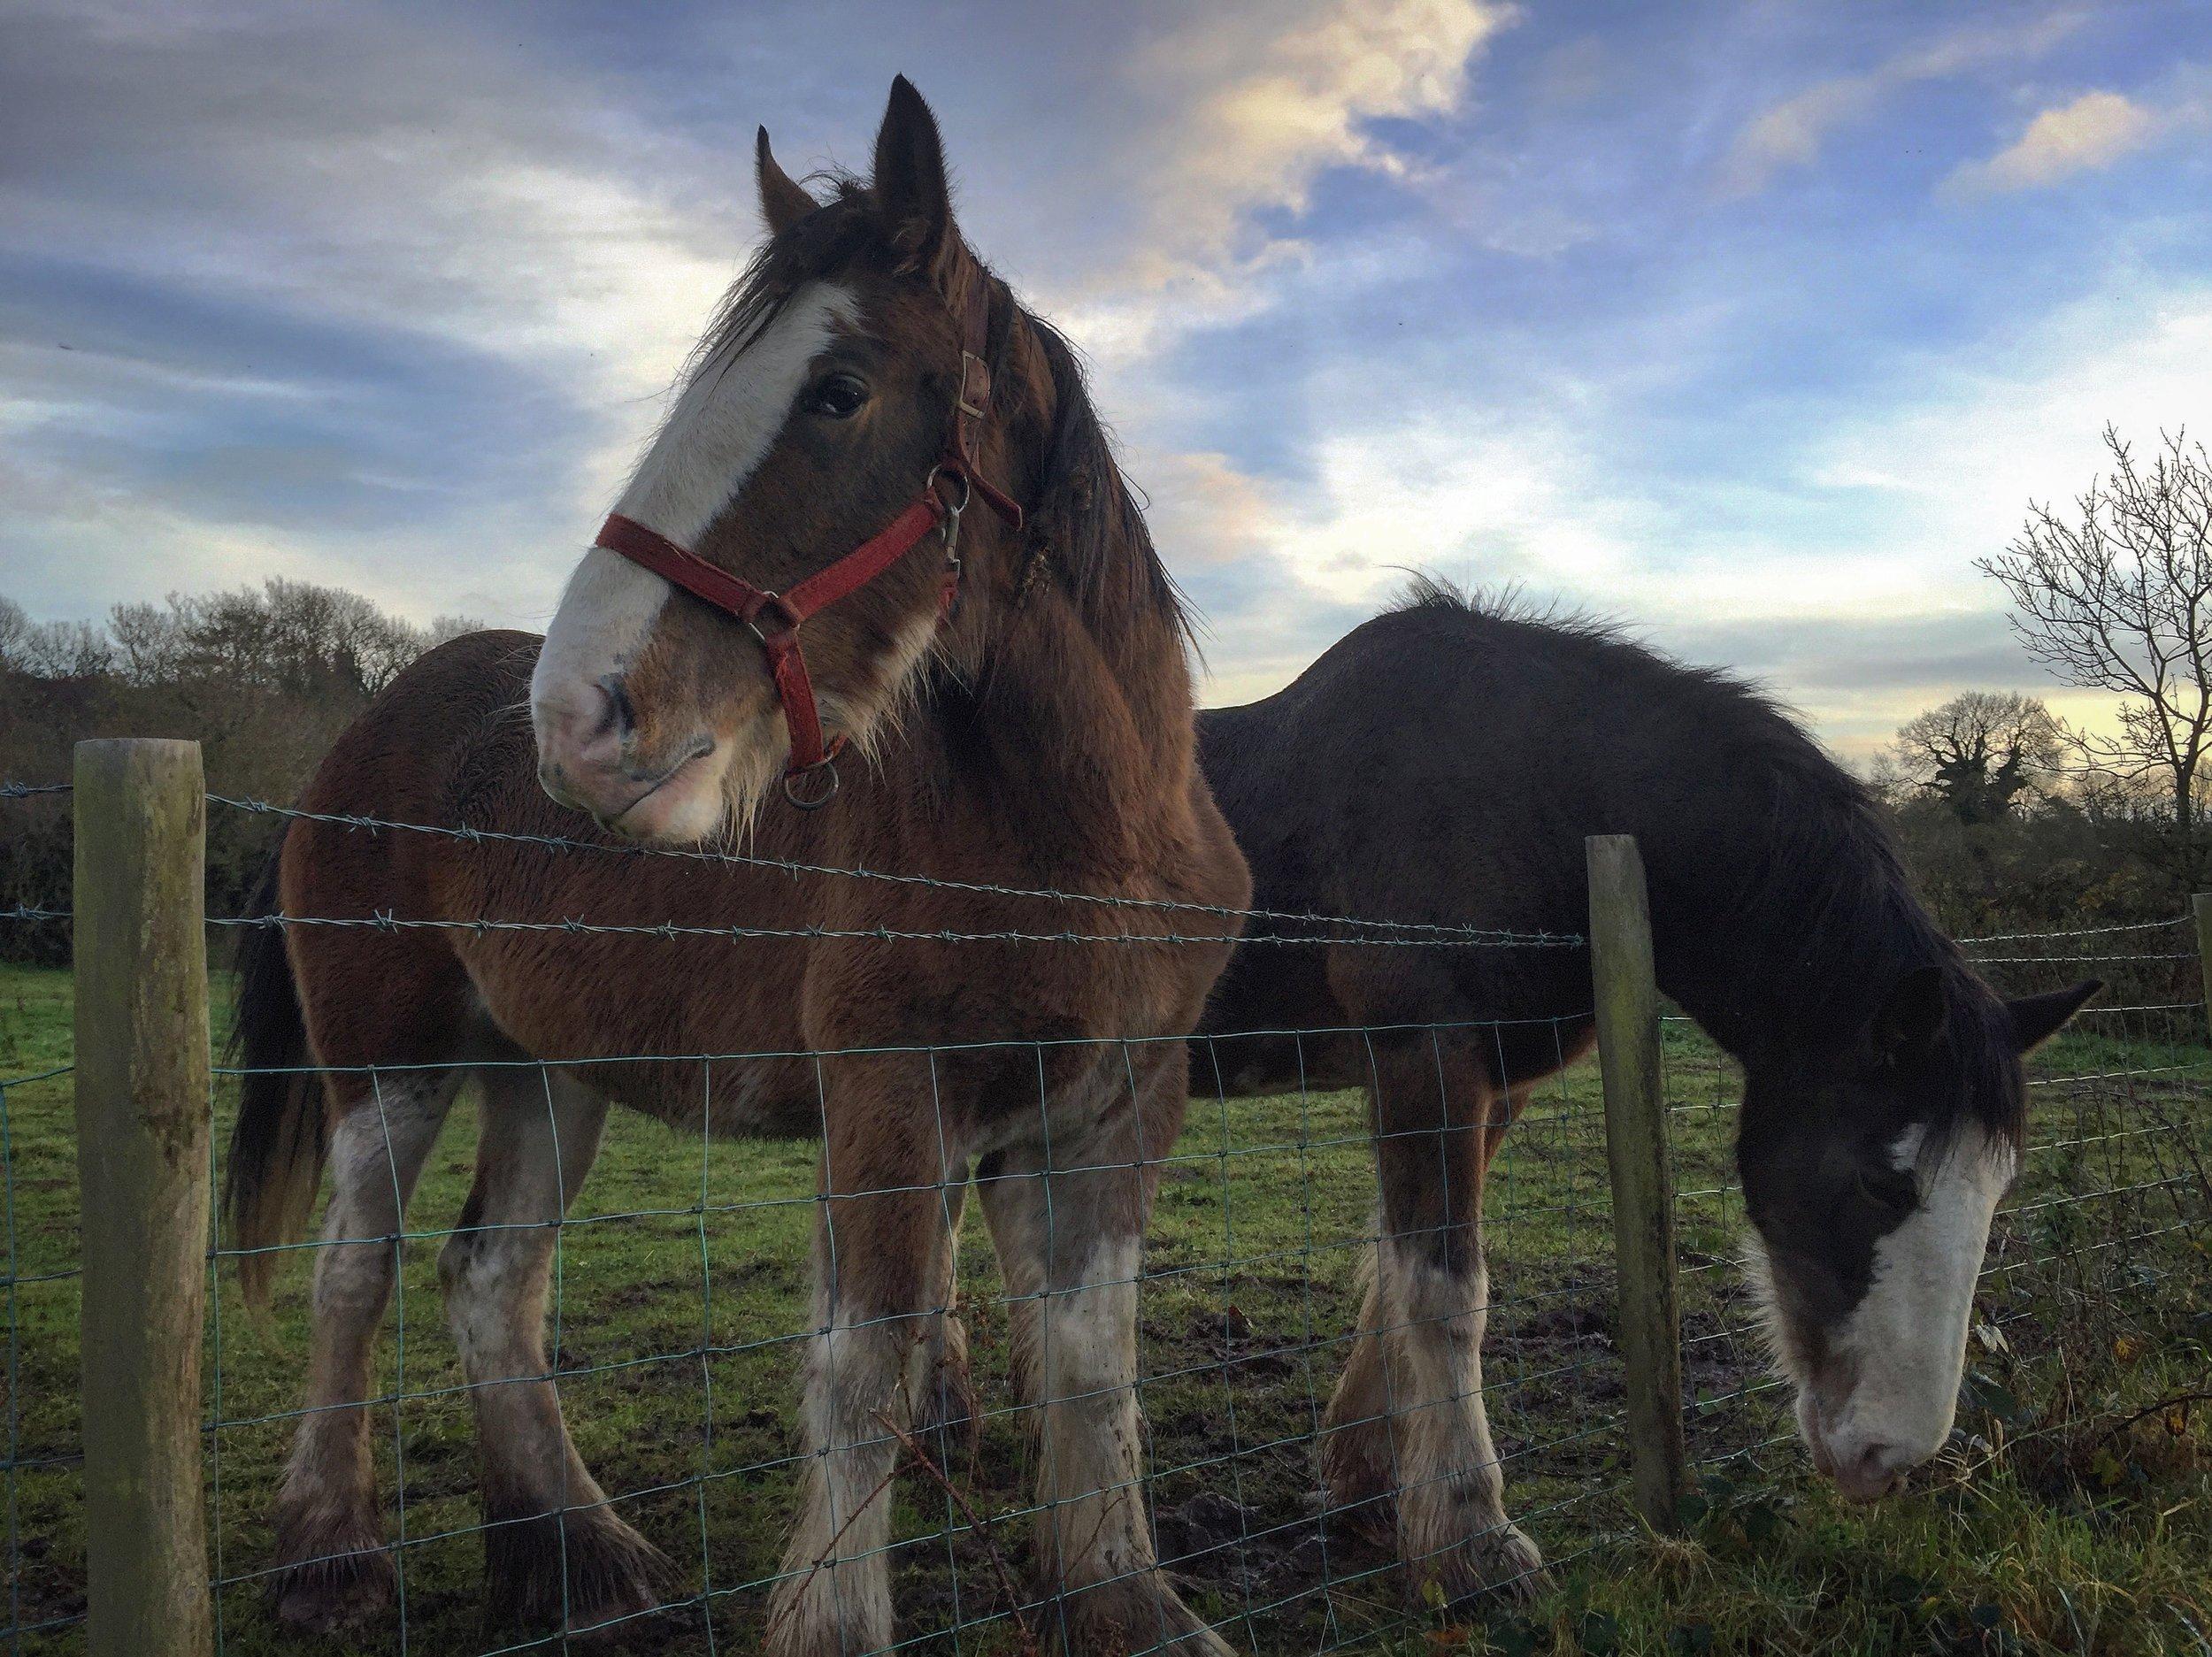 horses_kinbane_head_castle_northern_ireland_niexplorer_ni_explorer.jpg